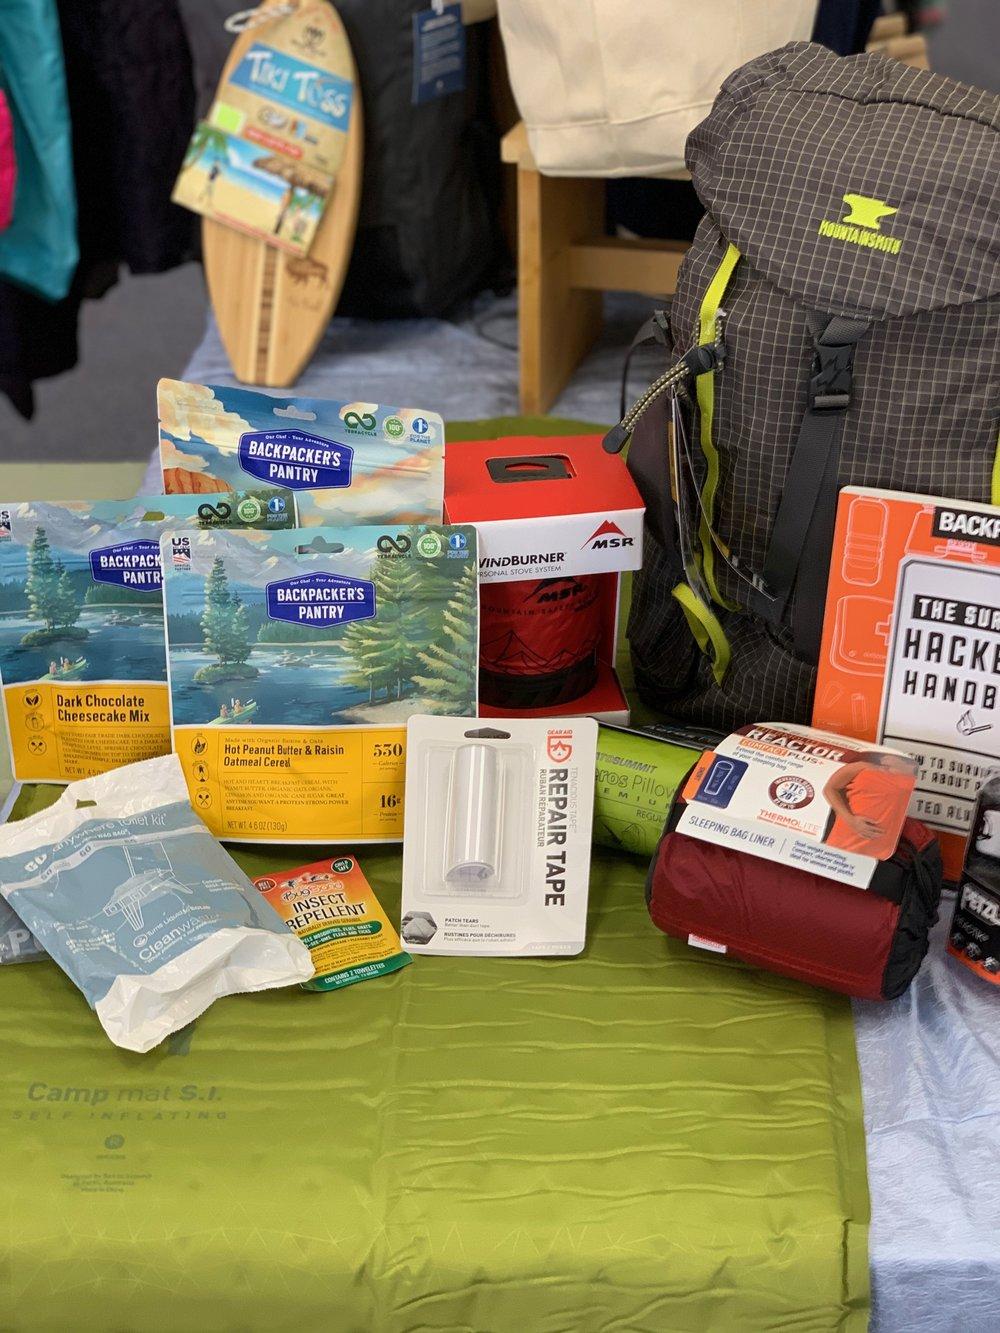 RAFFLE PRIZE #1 - Camping - MSR Windburner Stove: $150Mountainsmith Scream 25 Backpack: $80Sea to Summit Camp Pad SI: $70Sea to Summit Reactor Liner: $65Sea to Summit Aeros Pillow: $43Petzl Reactik Headlamp: $90Survival Hacker Handbook: $30Backpacker Pantry Meals: $20Gear Aid Repair Tape: $5Total Approximate Retail Value: $550